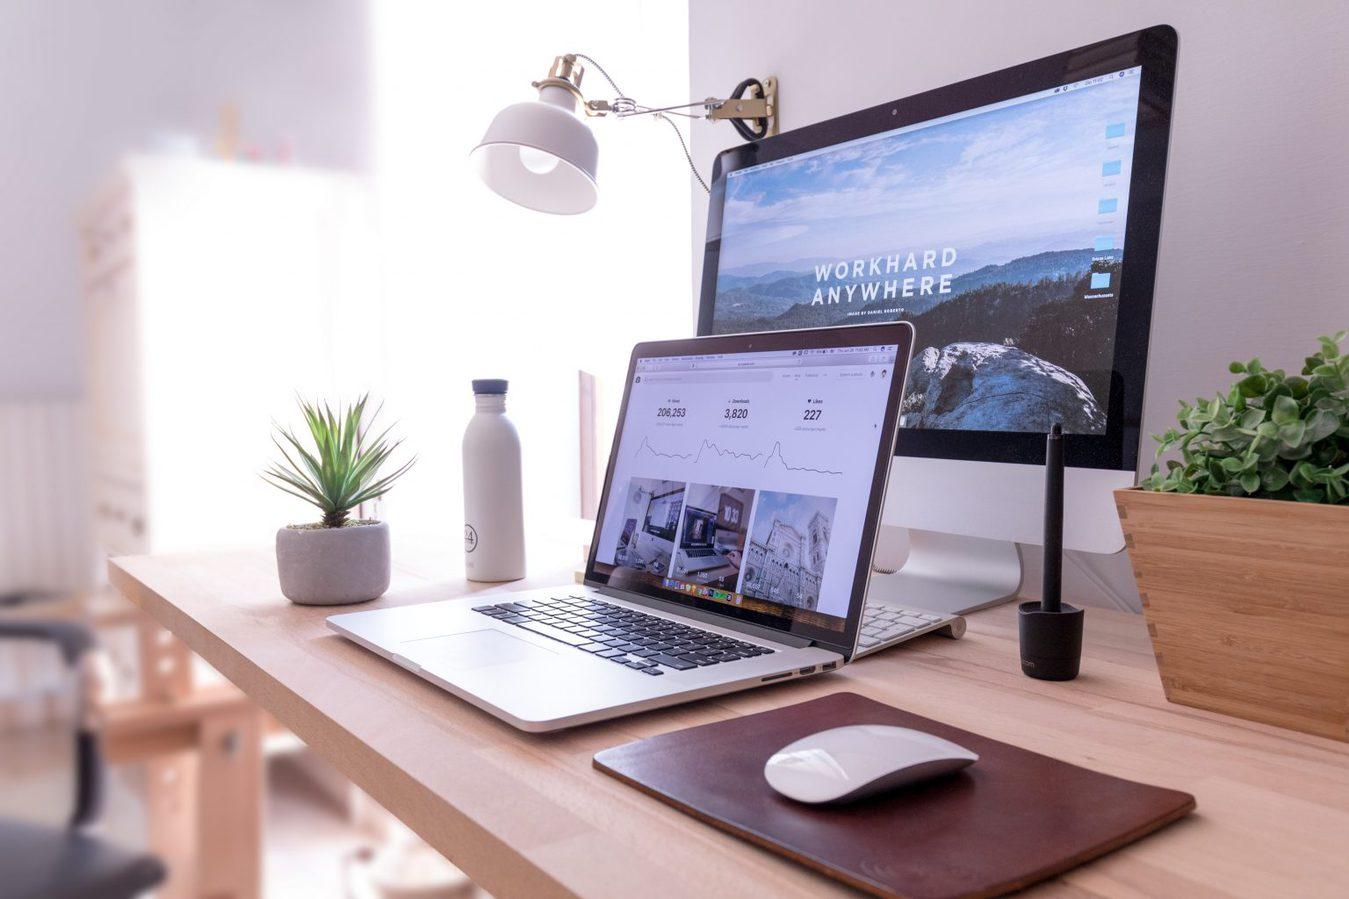 desk with desktop and laptop computers set up